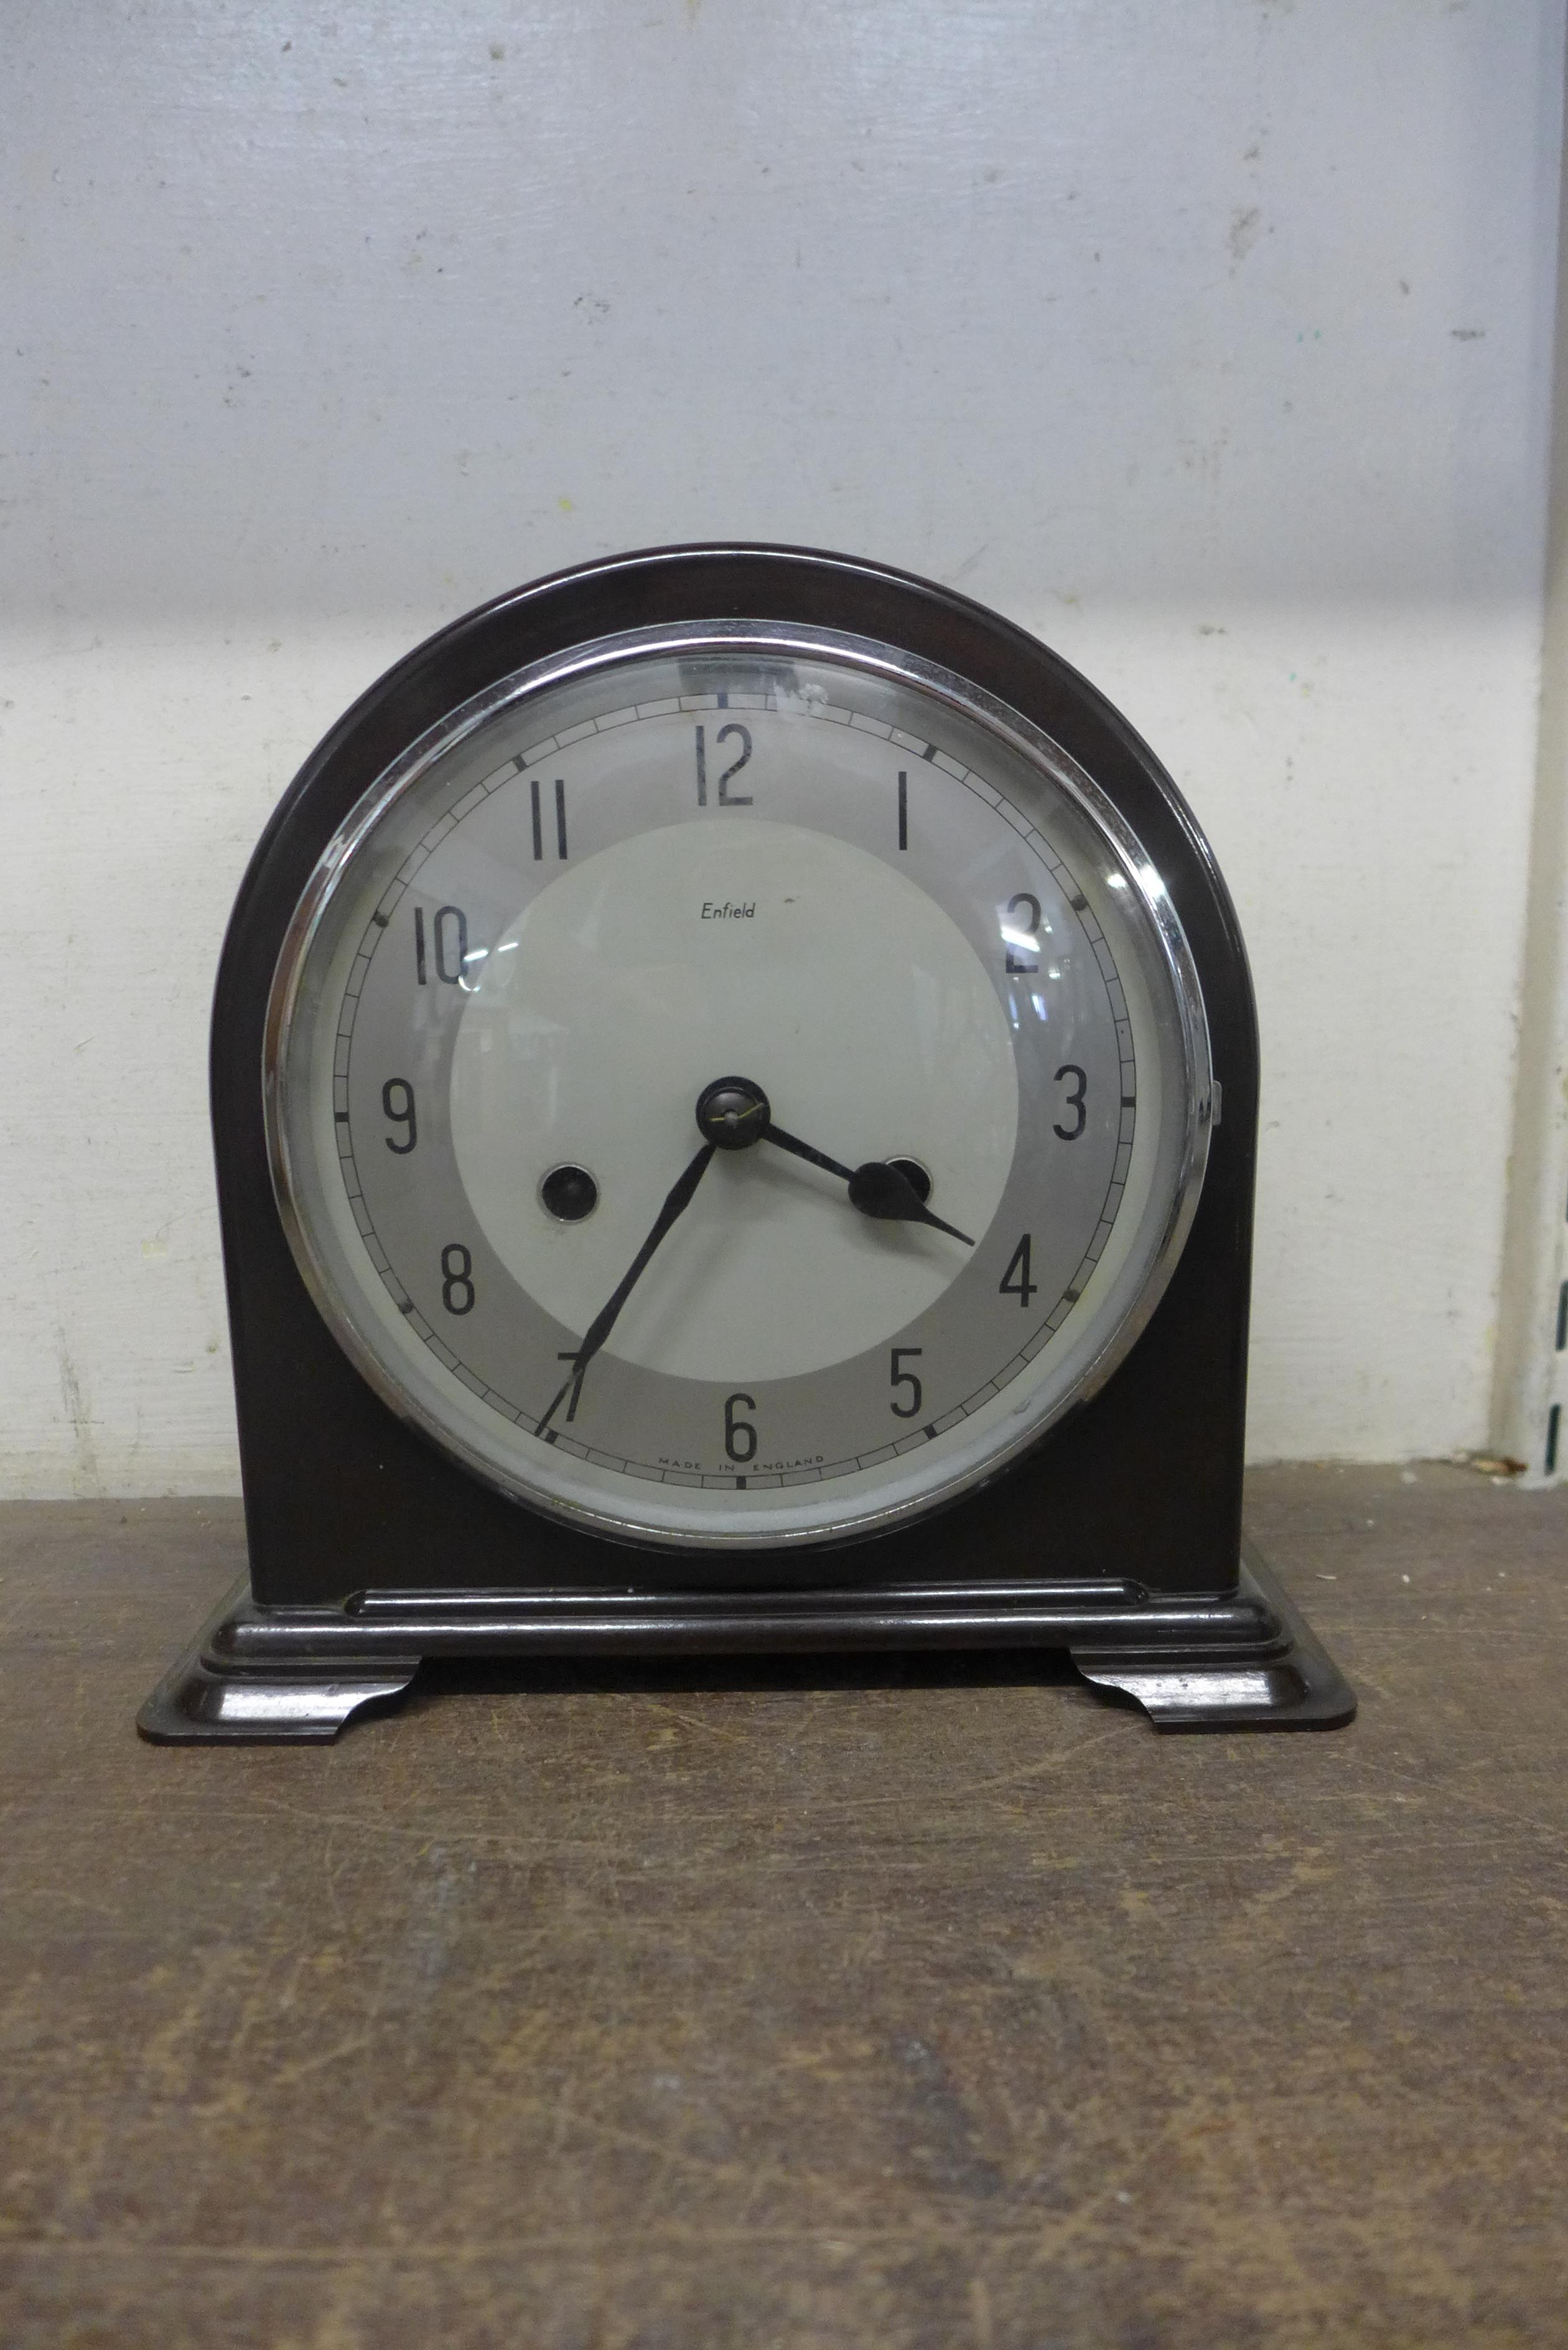 An Enfield Bakelite mantel clock